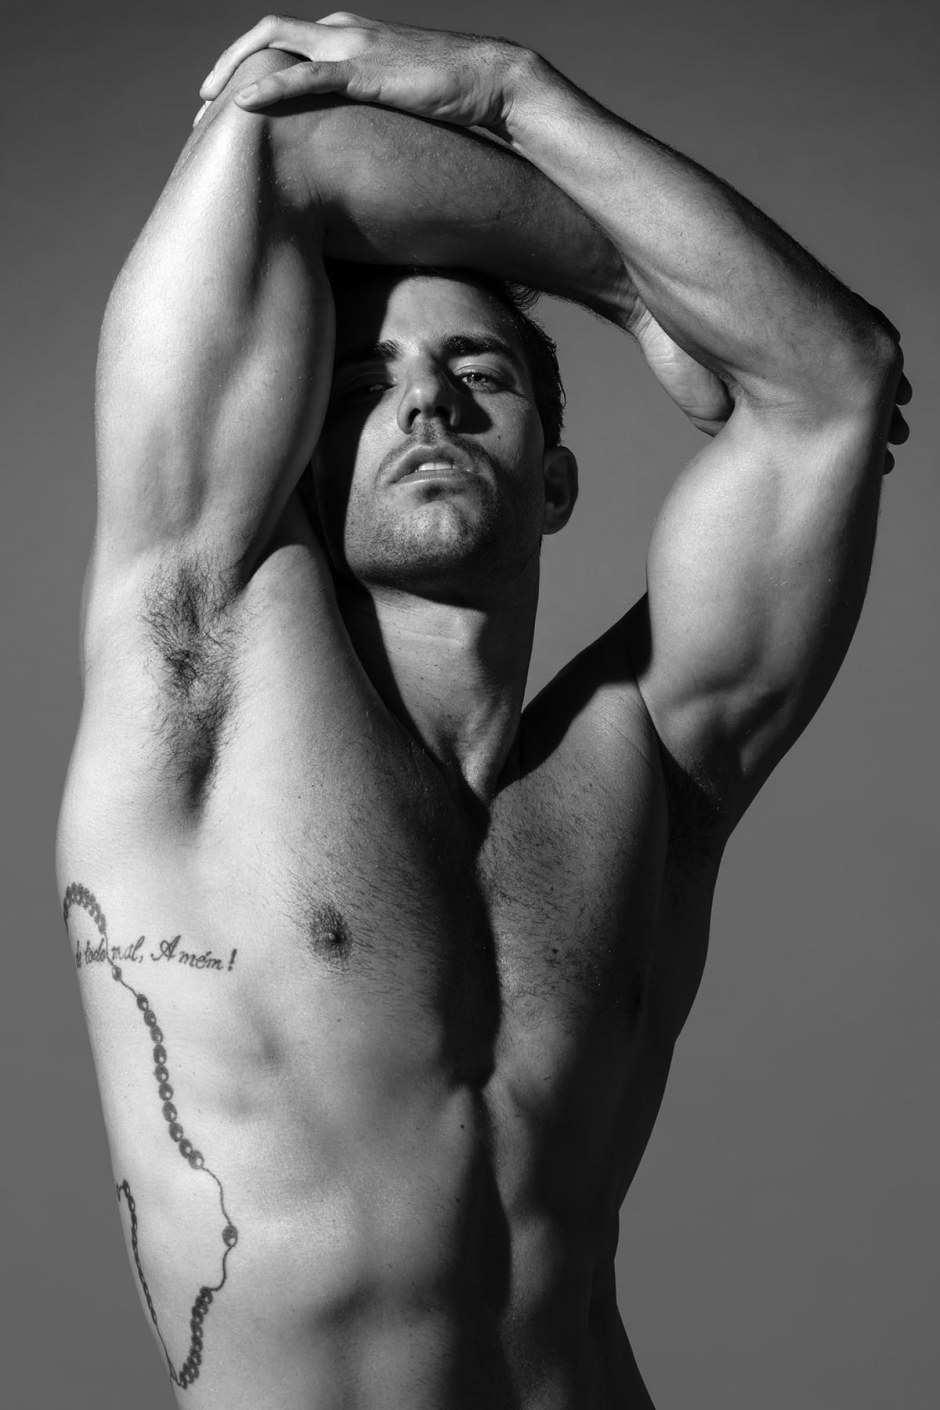 Hugo Tenorio by Wong Sim for Brazilian Male Model_002